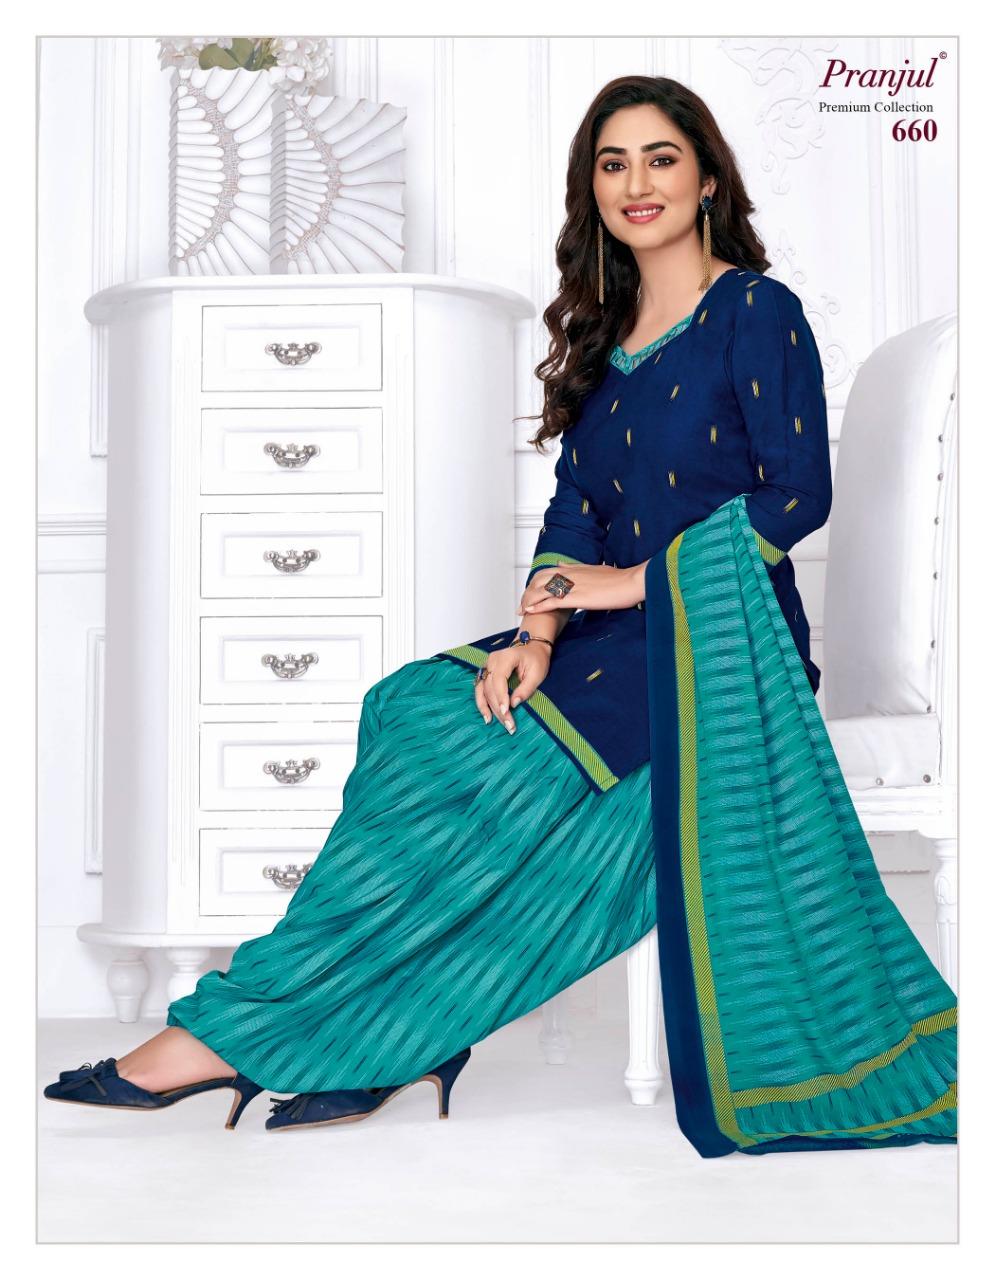 Pranjul Priyanka Vol 6 Premium Collection Readymade Suit Wholesale Catalog 15 Pcs 17 - Pranjul Priyanka Vol 6 Premium Collection Readymade Suit Wholesale Catalog 15 Pcs